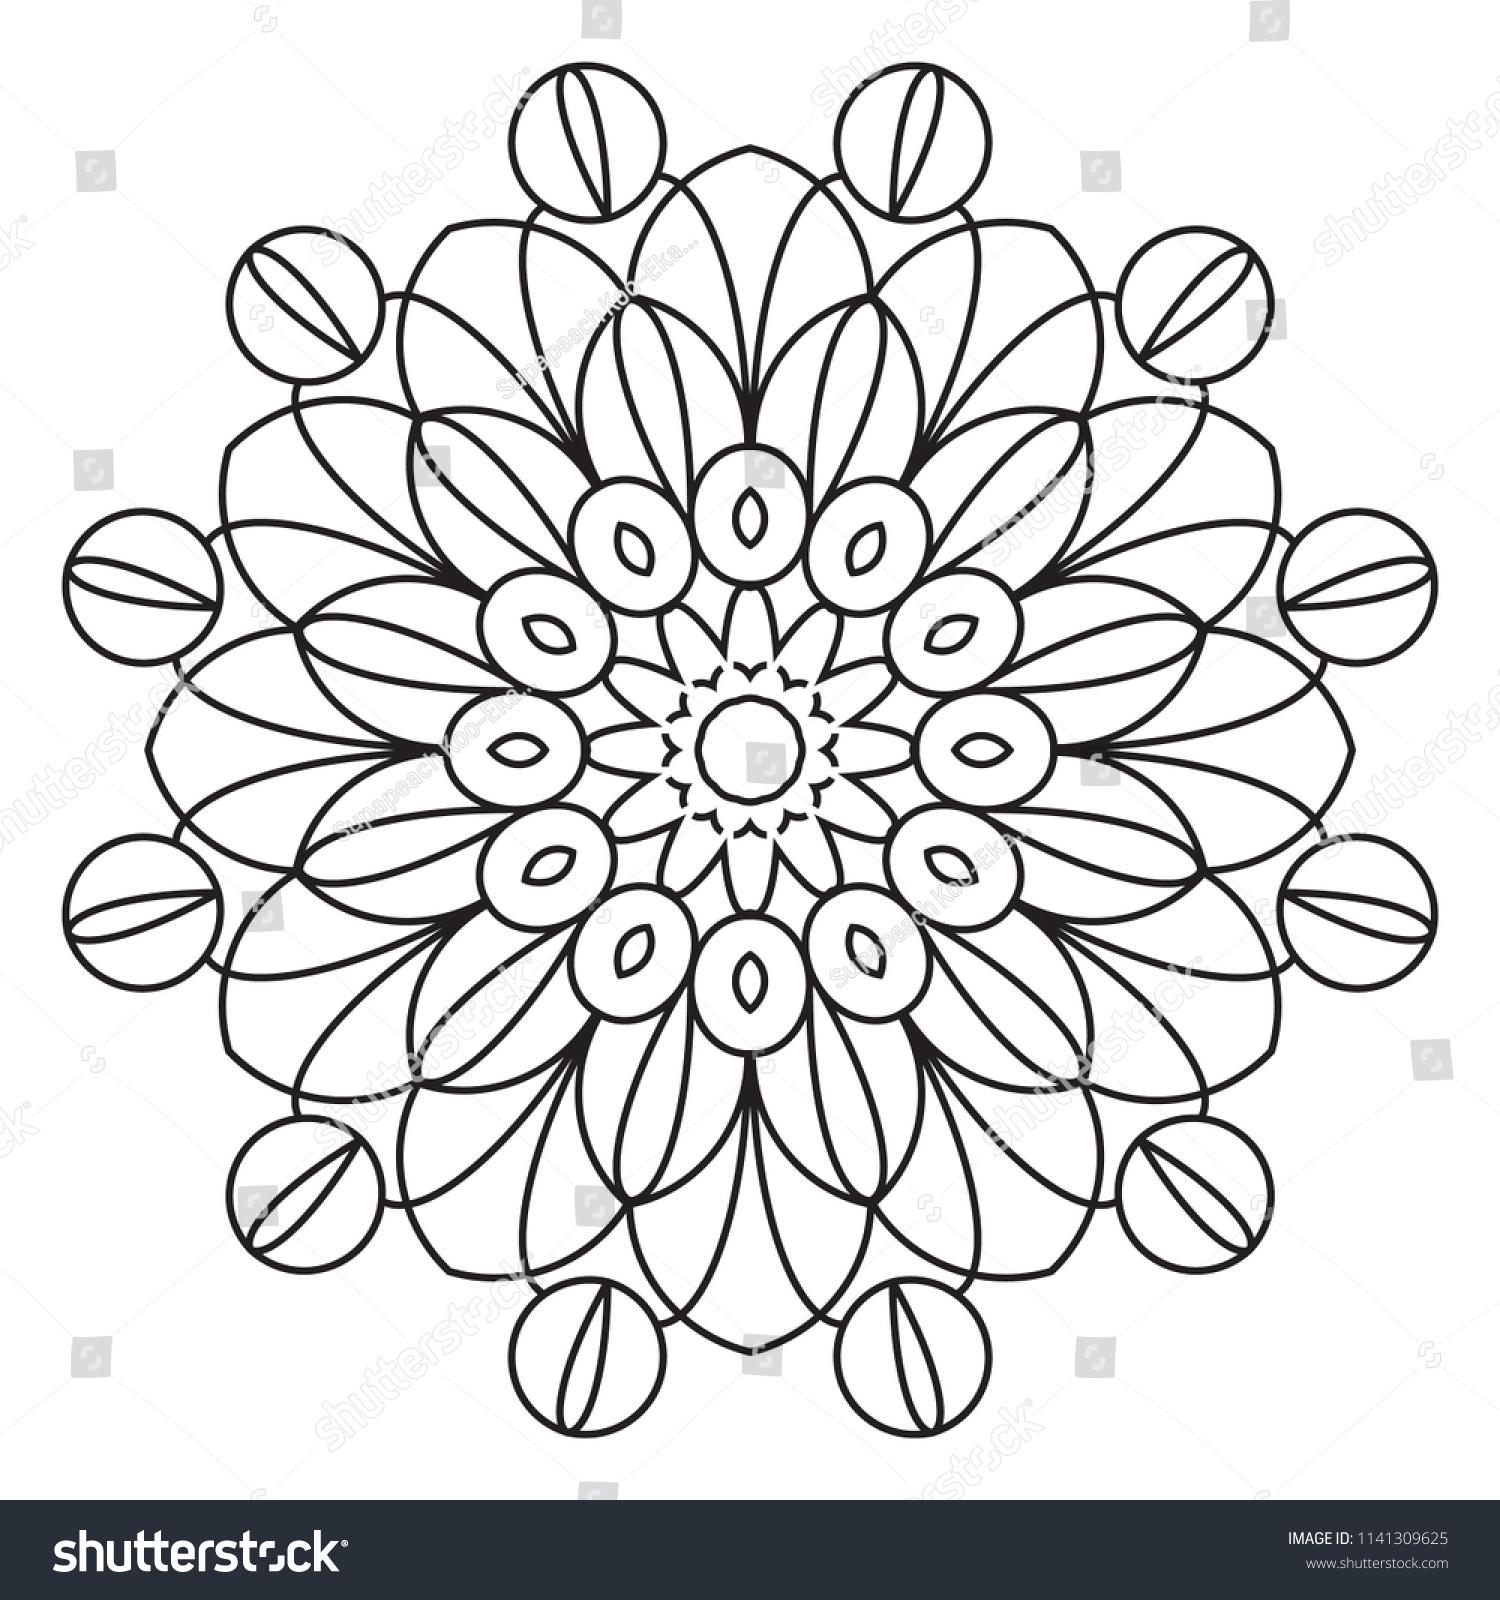 Basic Mandala Easy Mandalas Coloring Pattern Stock Illustration